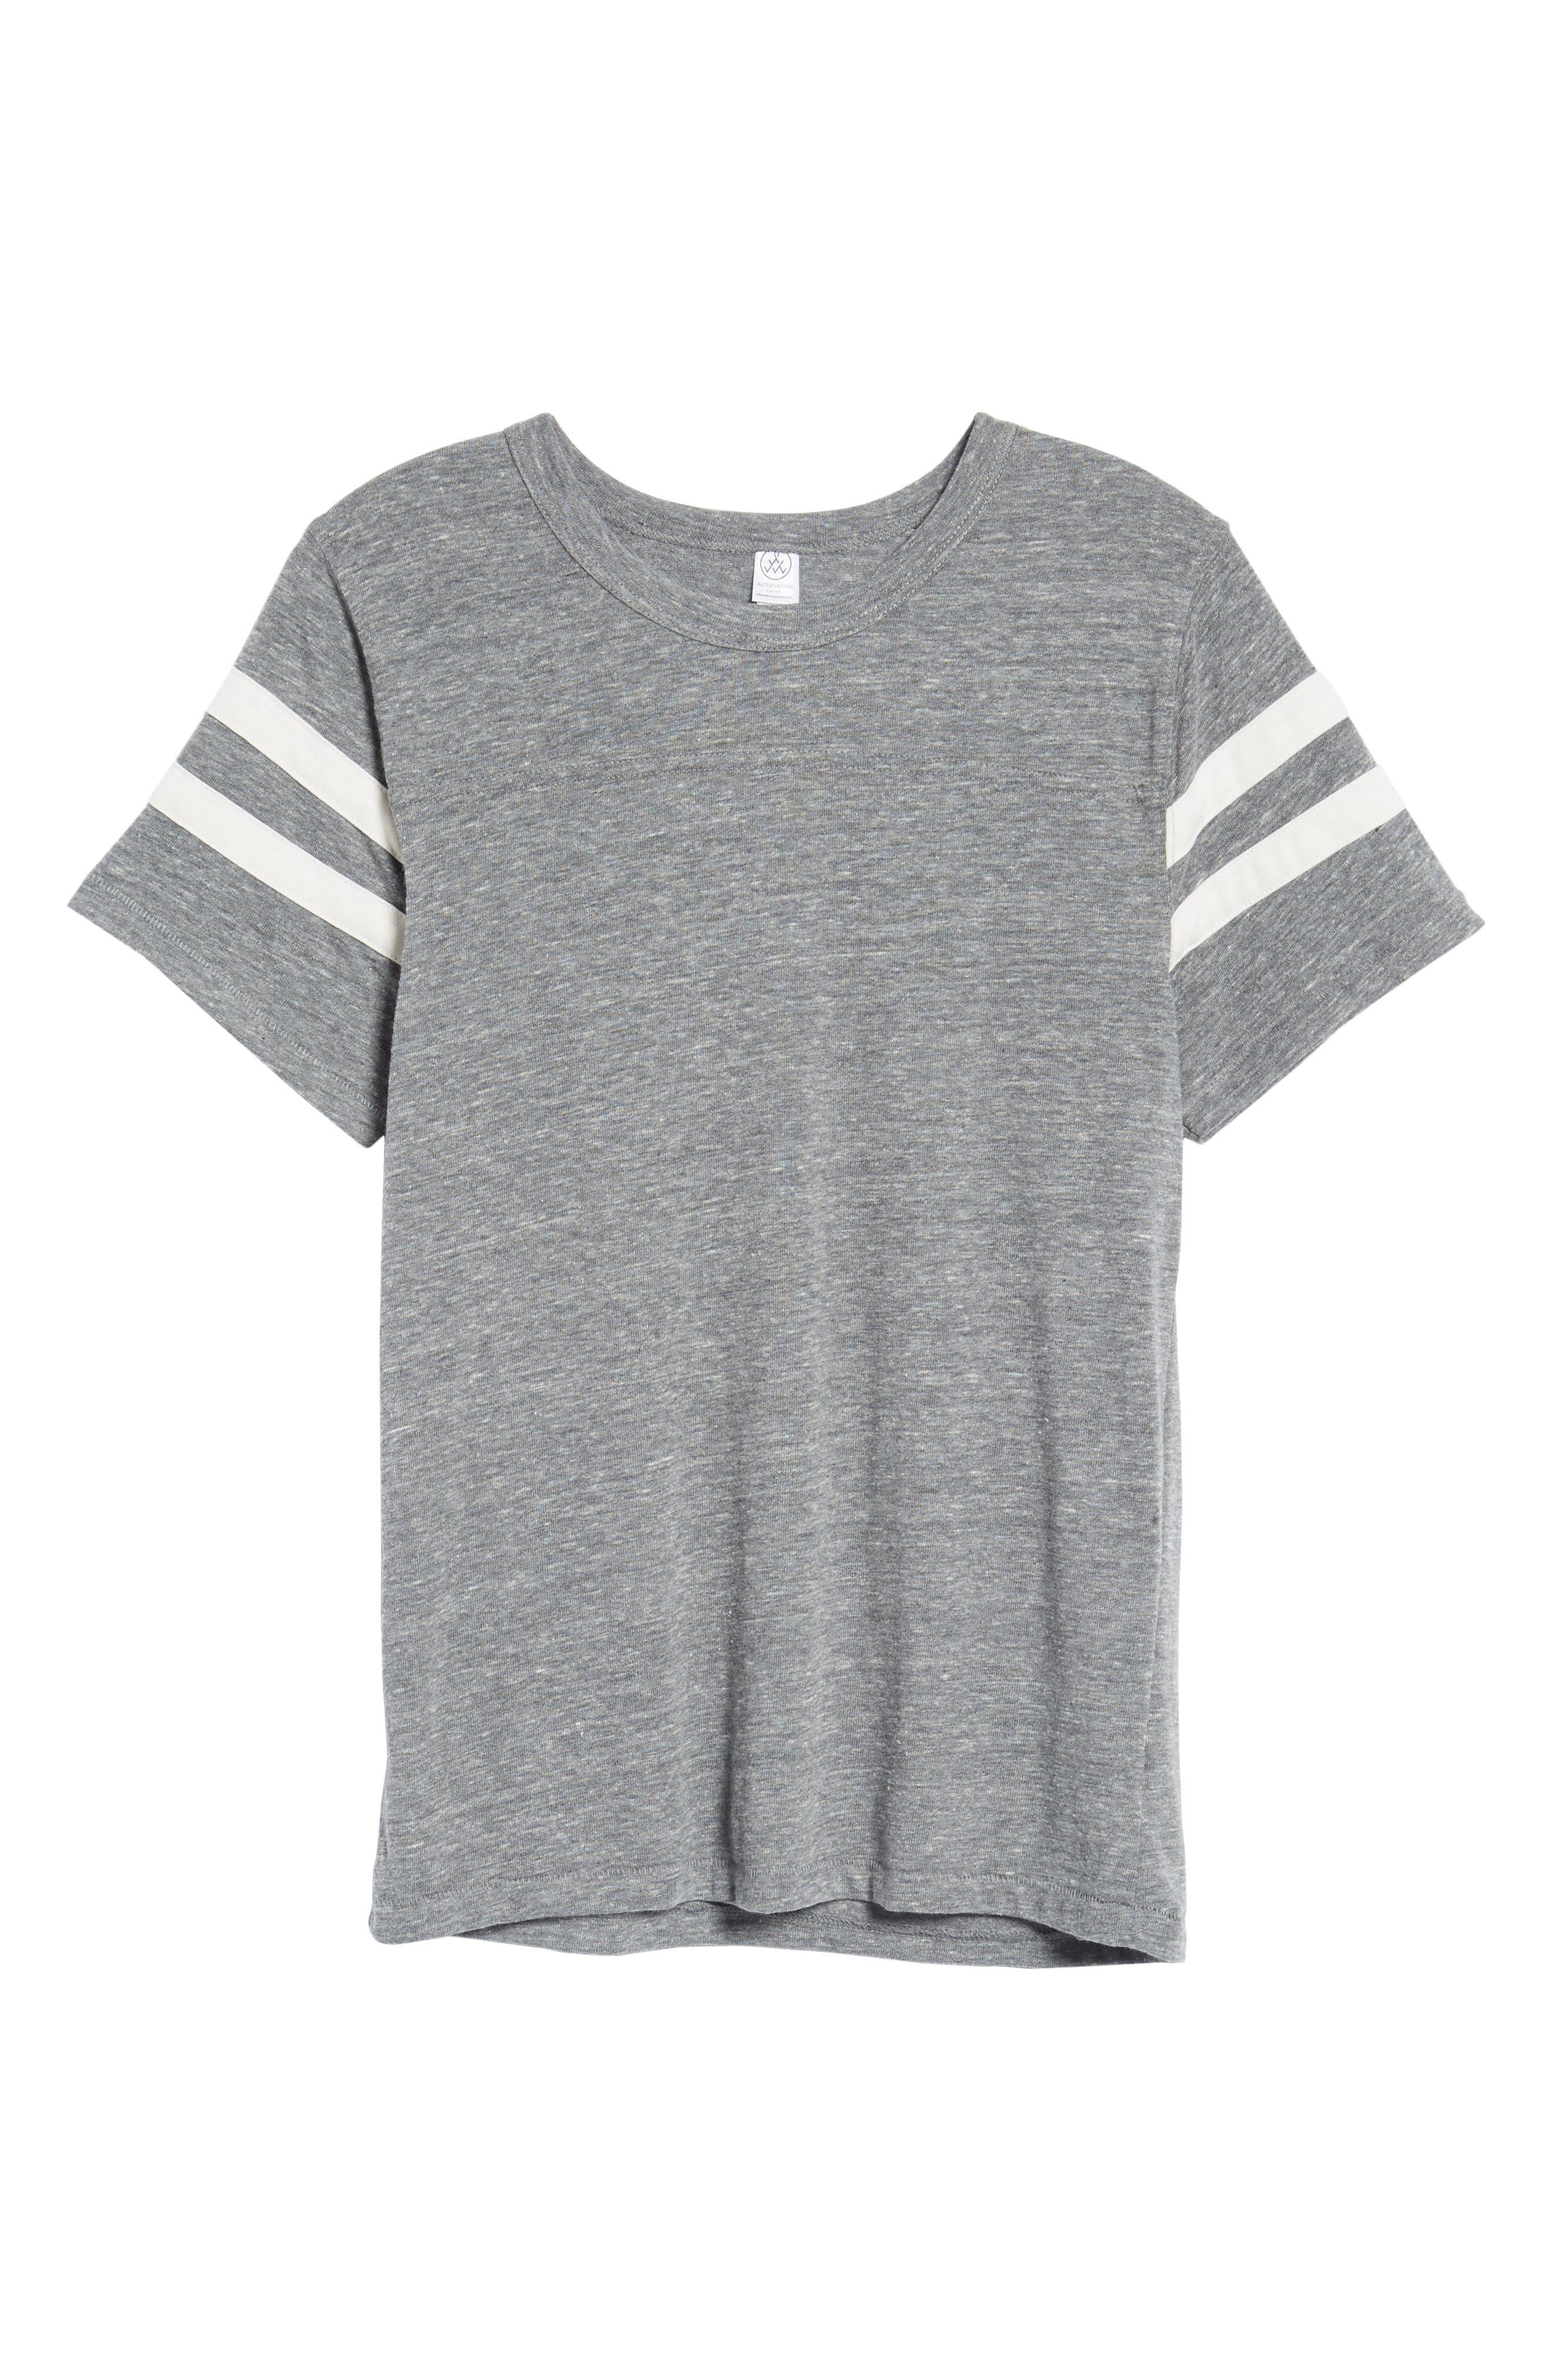 Football T-Shirt,                             Alternate thumbnail 6, color,                             Eco Grey/ Eco Ivory